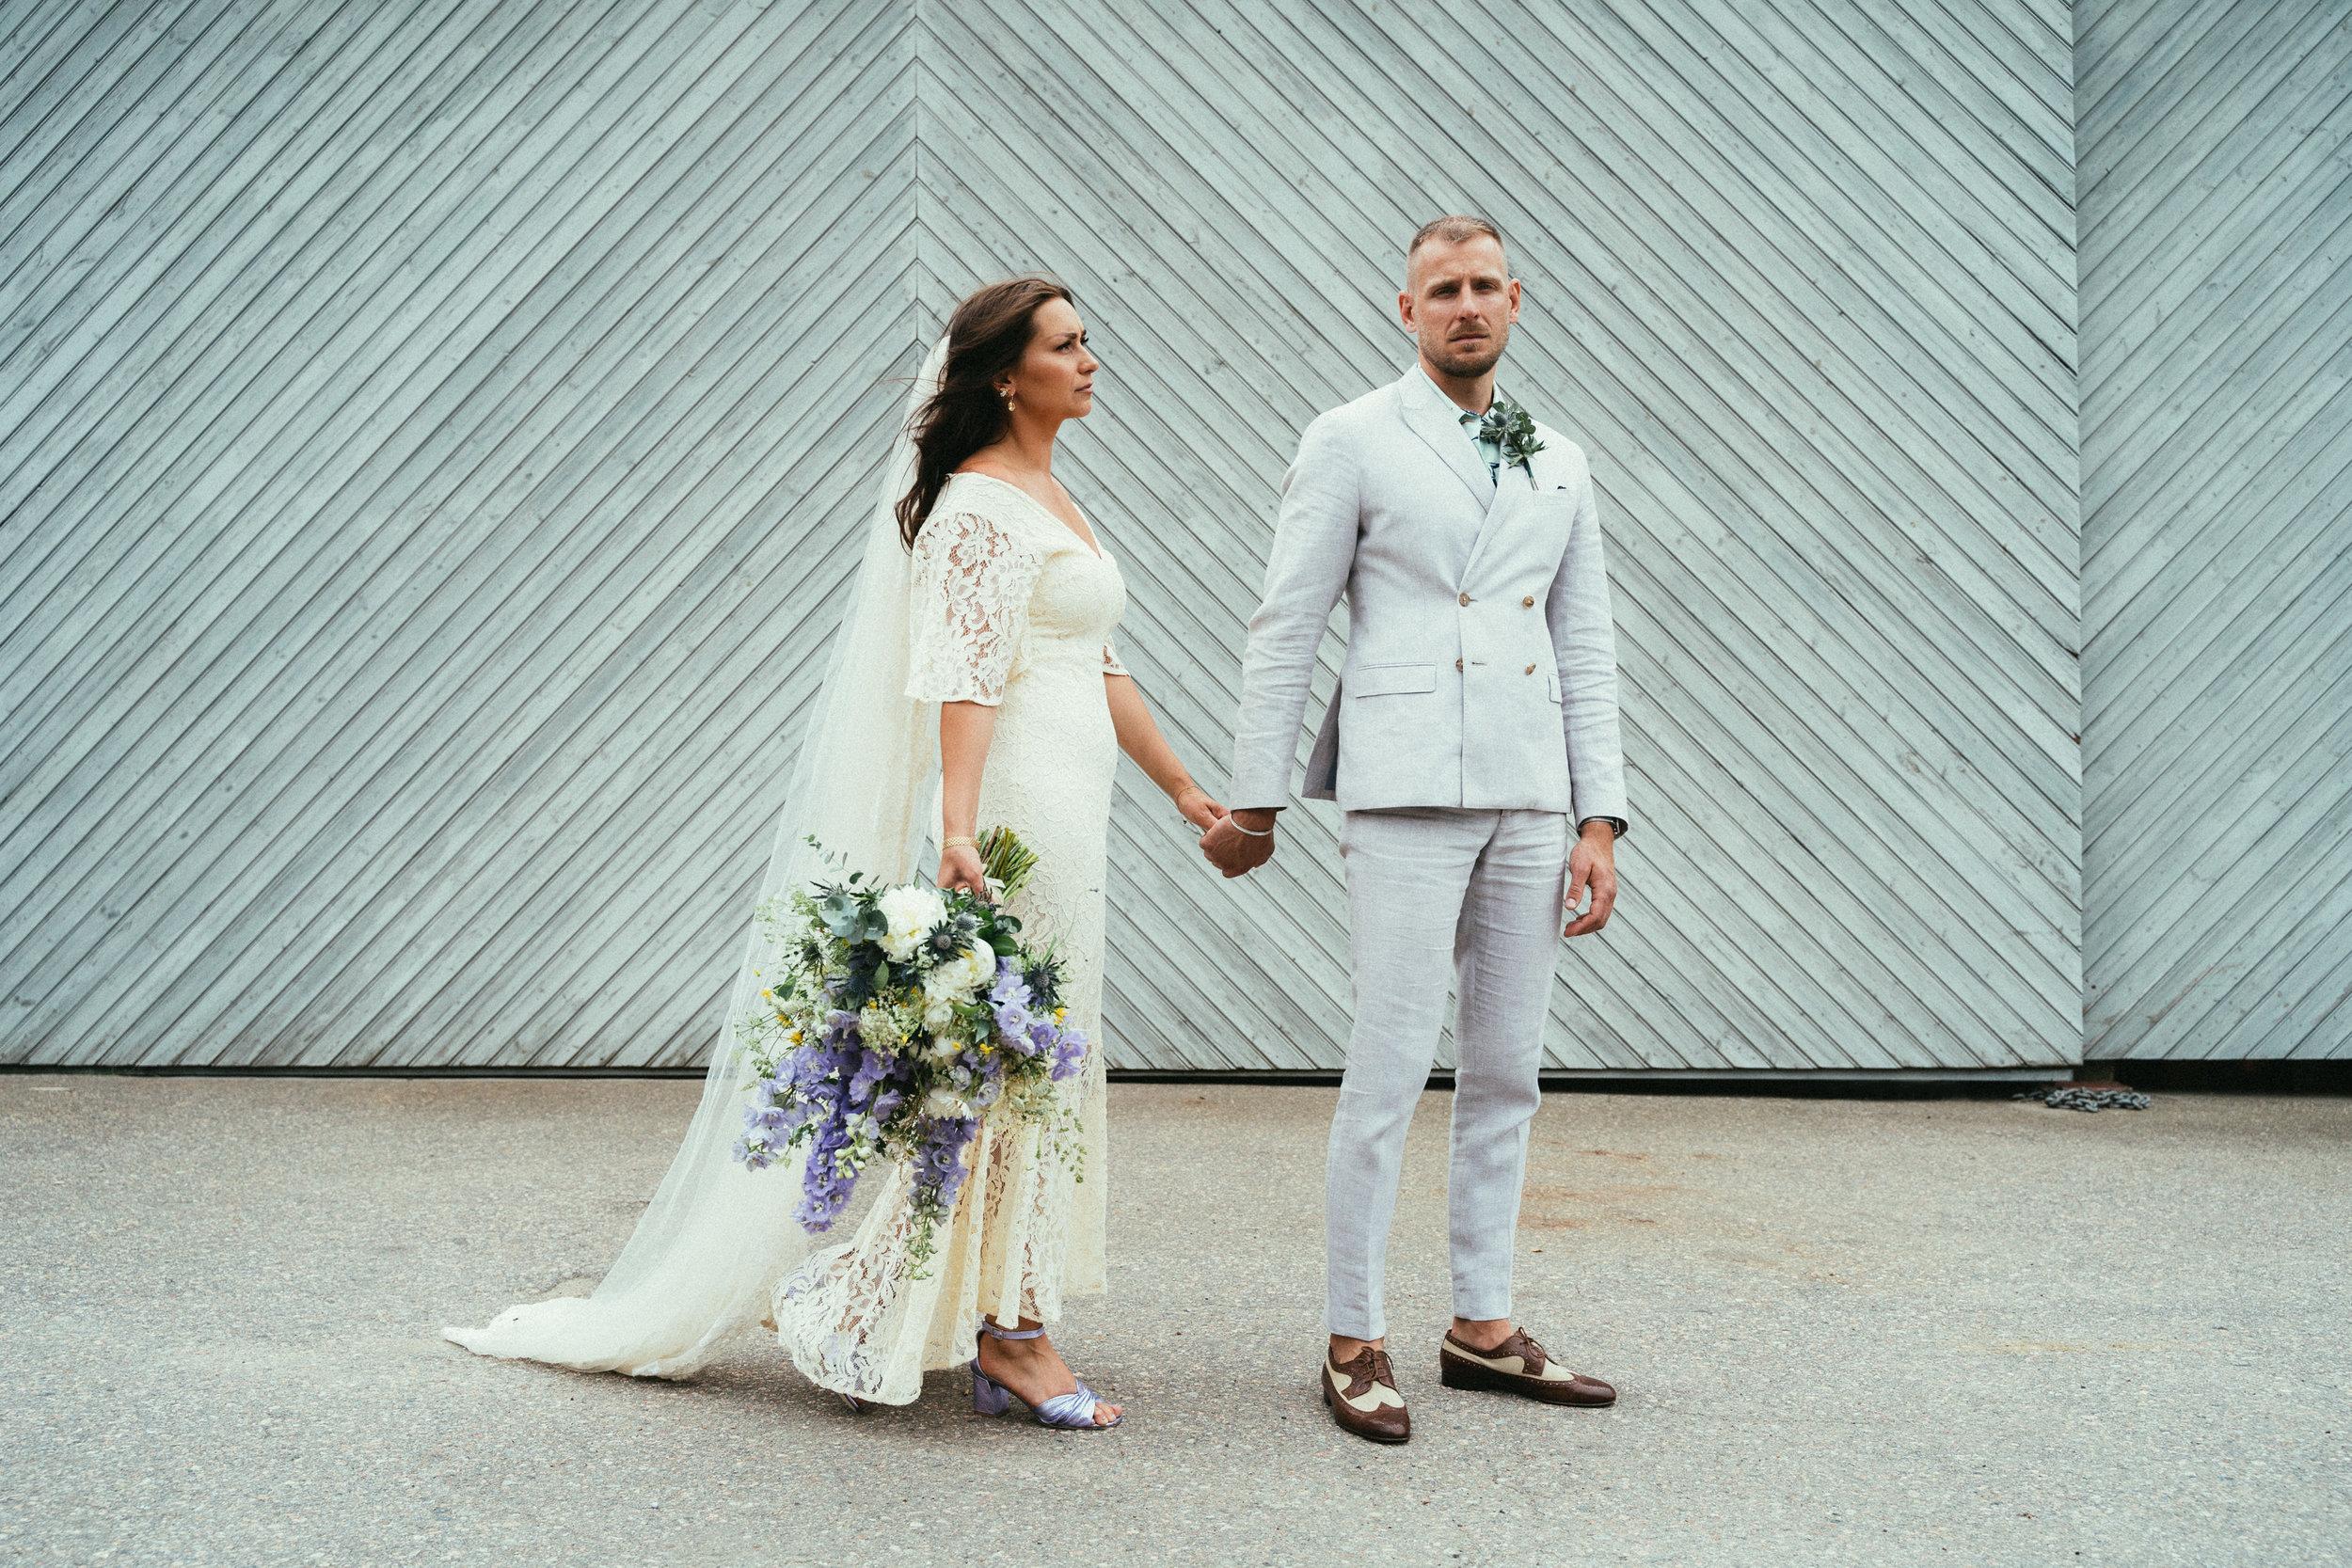 moa&alex_bröllopsdag_porträtt_web-10.jpg